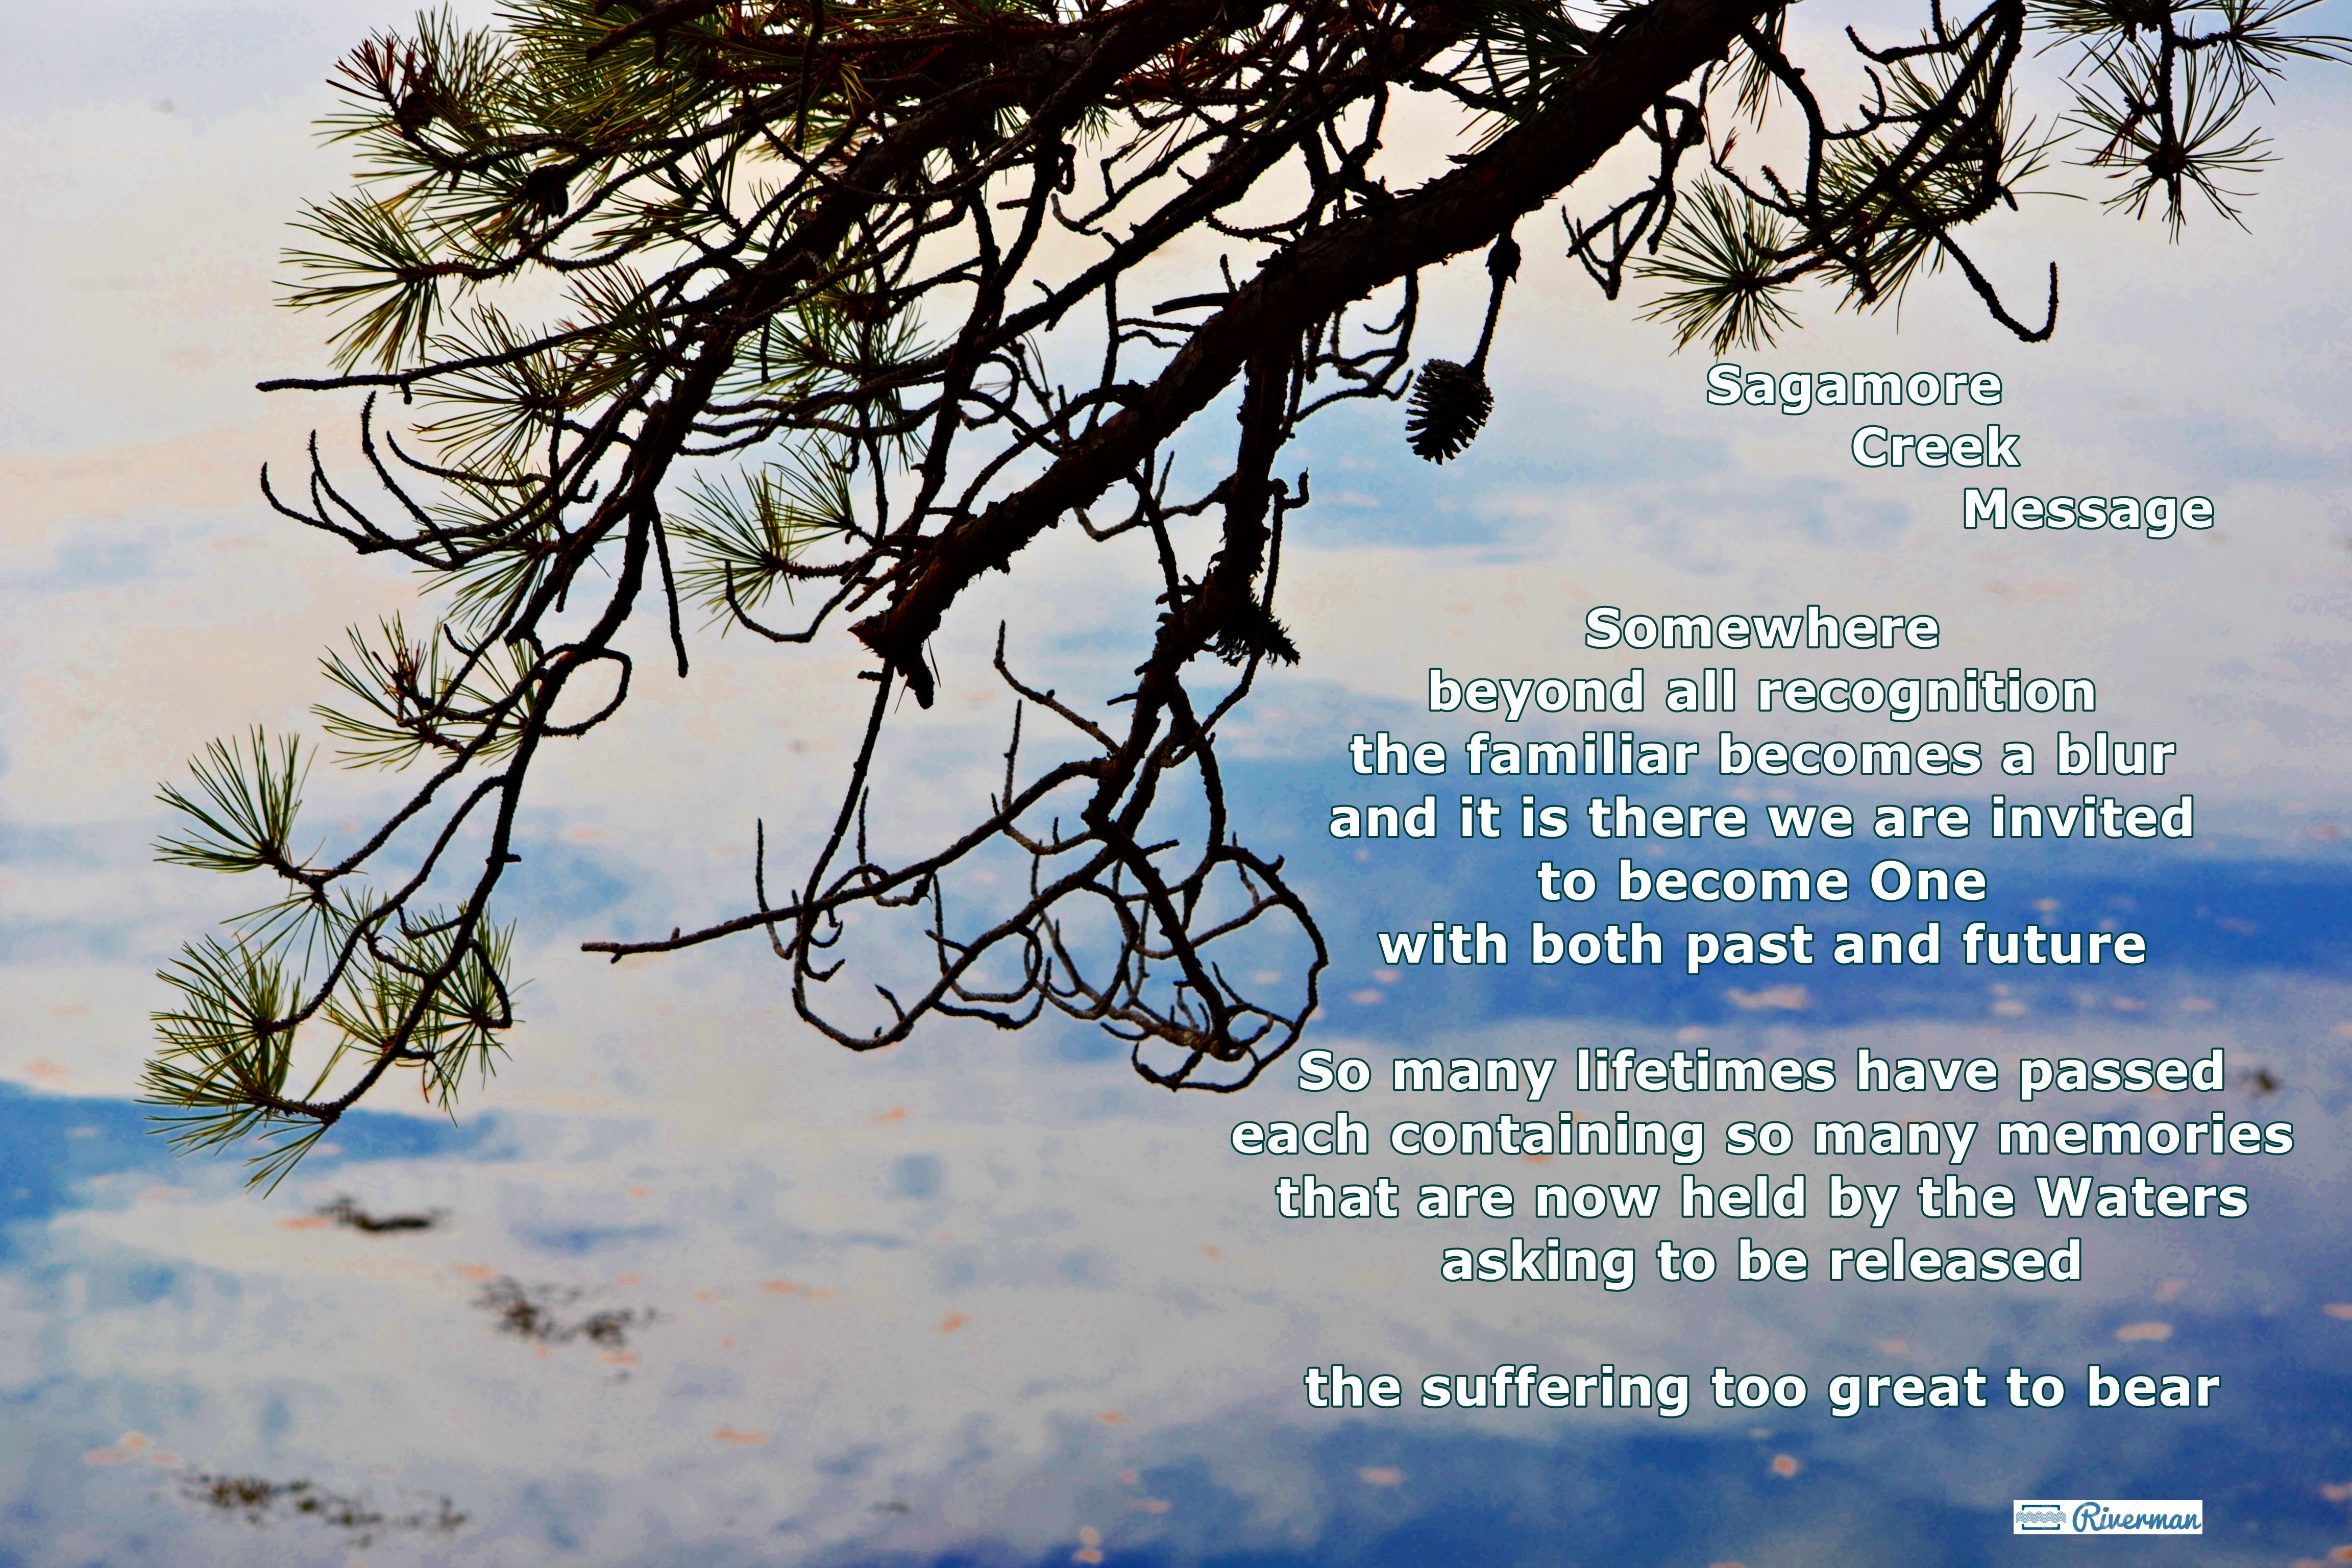 Sagamore Creek Message